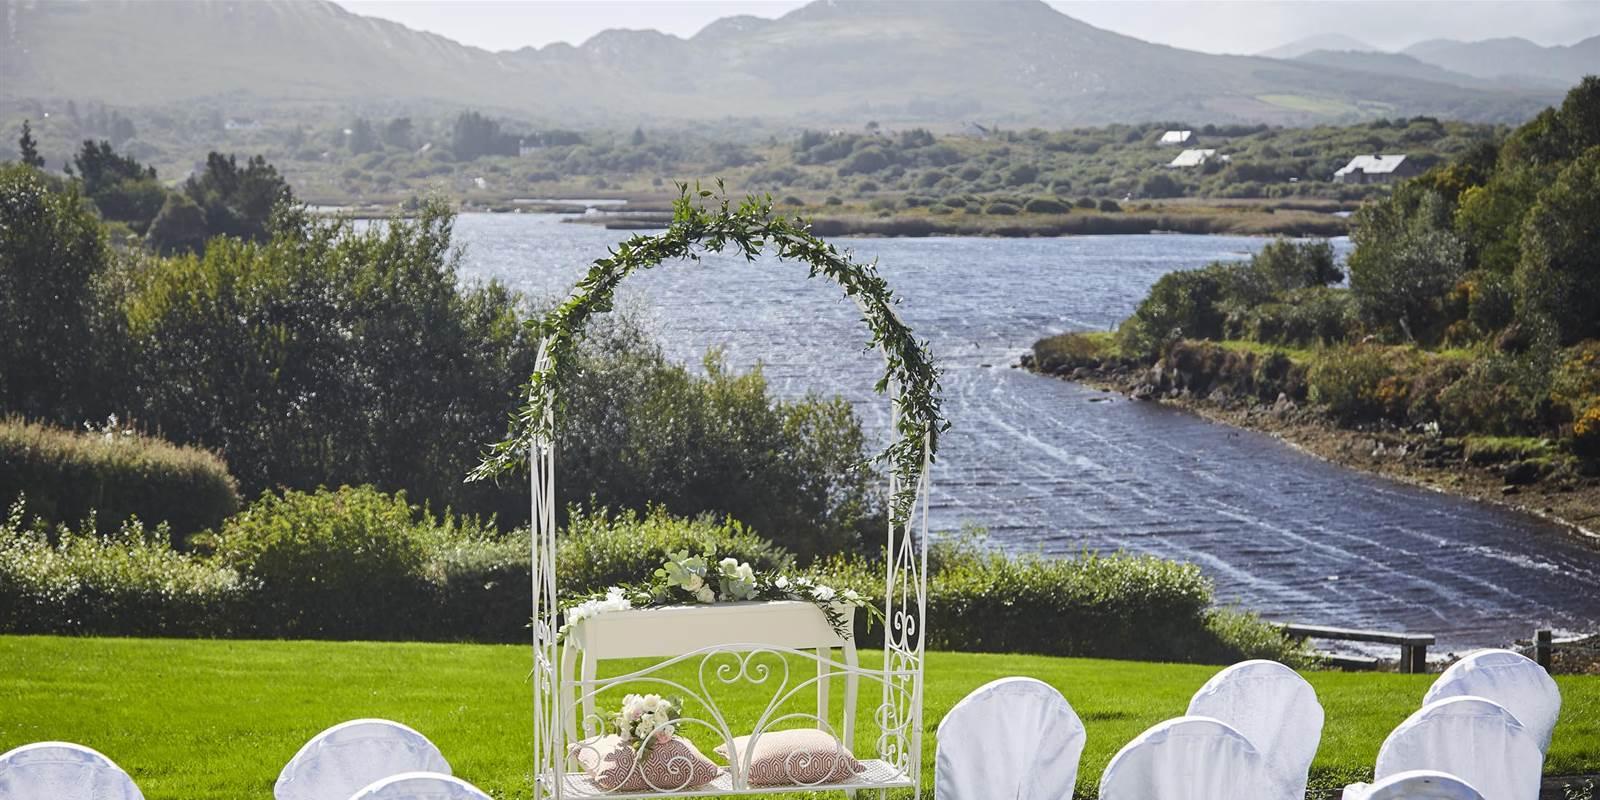 Outdoor Wedding venue in Kerry at Sneem 4 star hotel